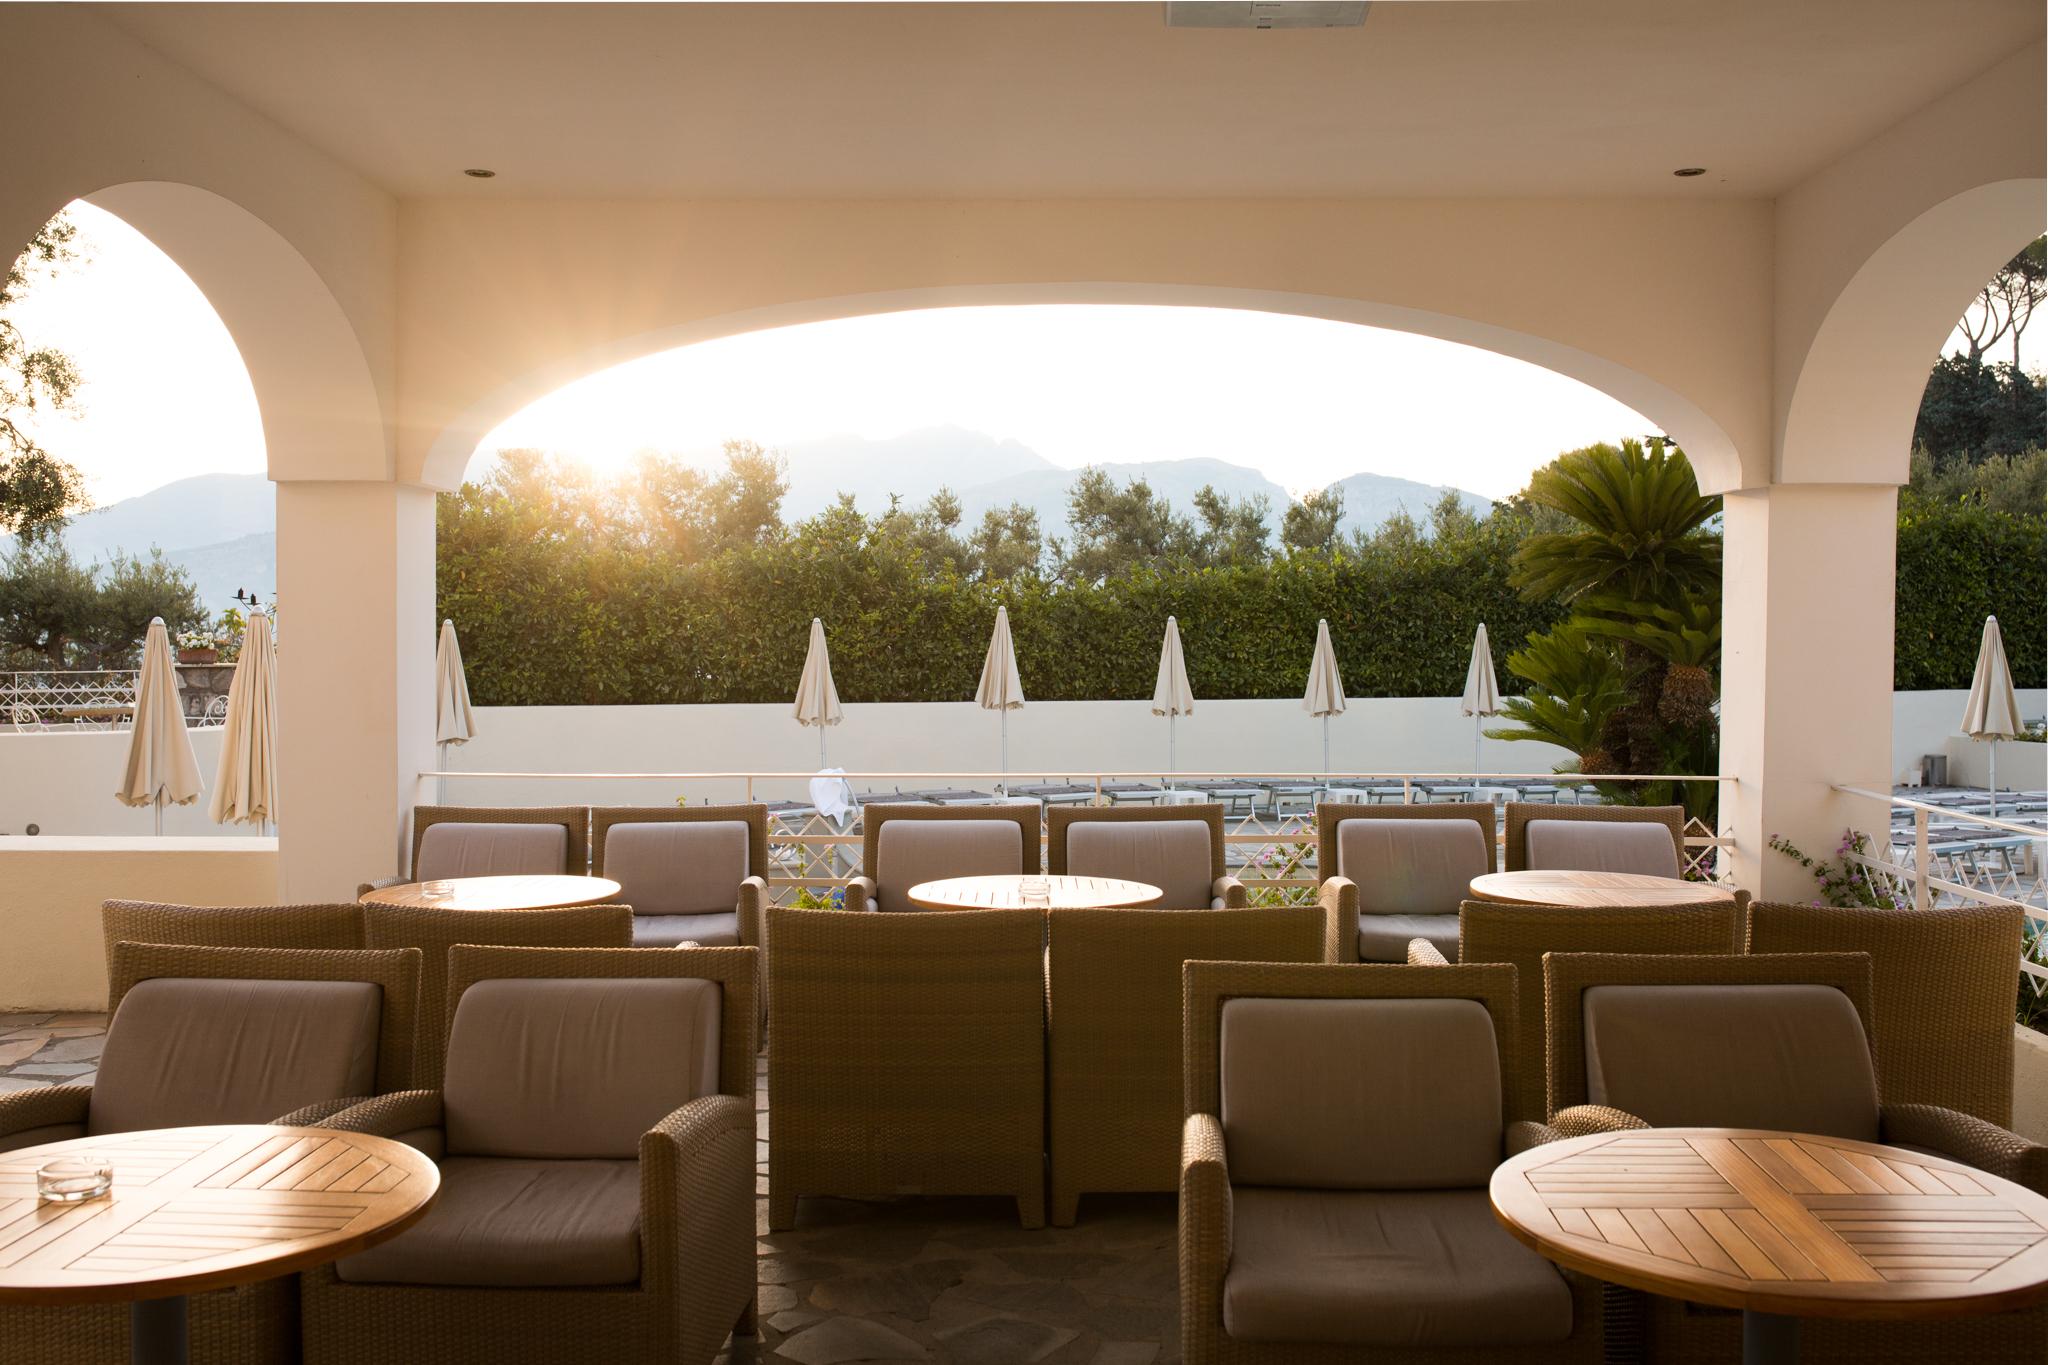 grand hotel aminta-grand hotel aminta sorrento-sorrento hotels-best views in sorrento-dafne restaurant-best sorrento restaurants-alina mendoza-alina mendoza photography-arose travels-7762.jpg